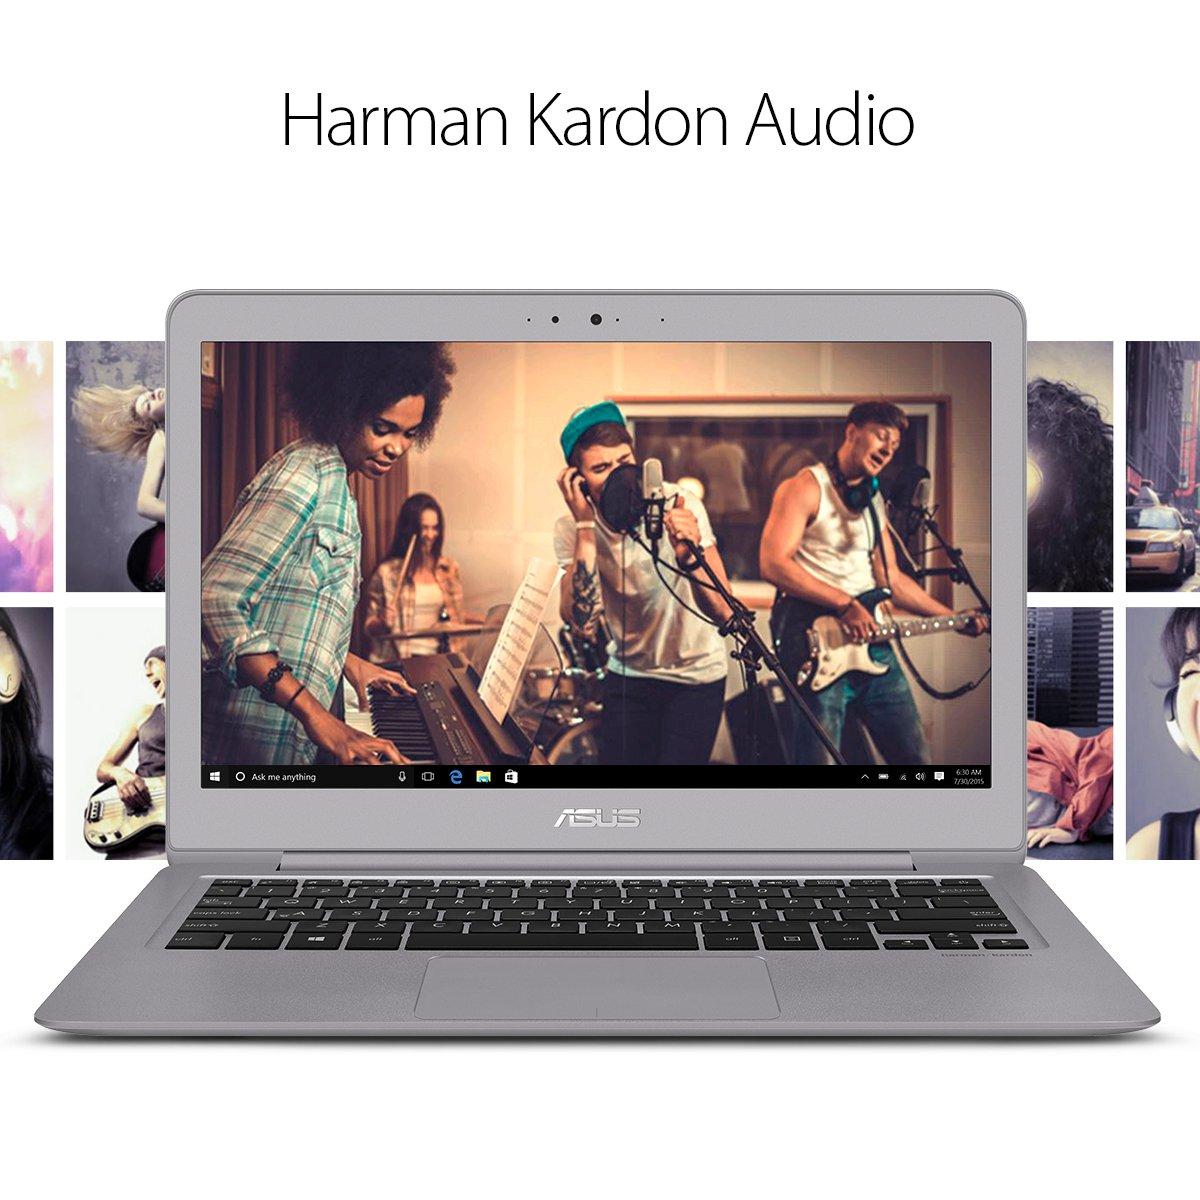 ASUS ZenBook UX330UA-AH54 13.3-inch LCD Ultra-Slim Laptop (Core i5 Processor, 8GB DDR3, 256GB SSD, Windows 10) w/ Harman Kardon Audio, Backlit keyboard, Fingerprint Reader by Asus (Image #5)